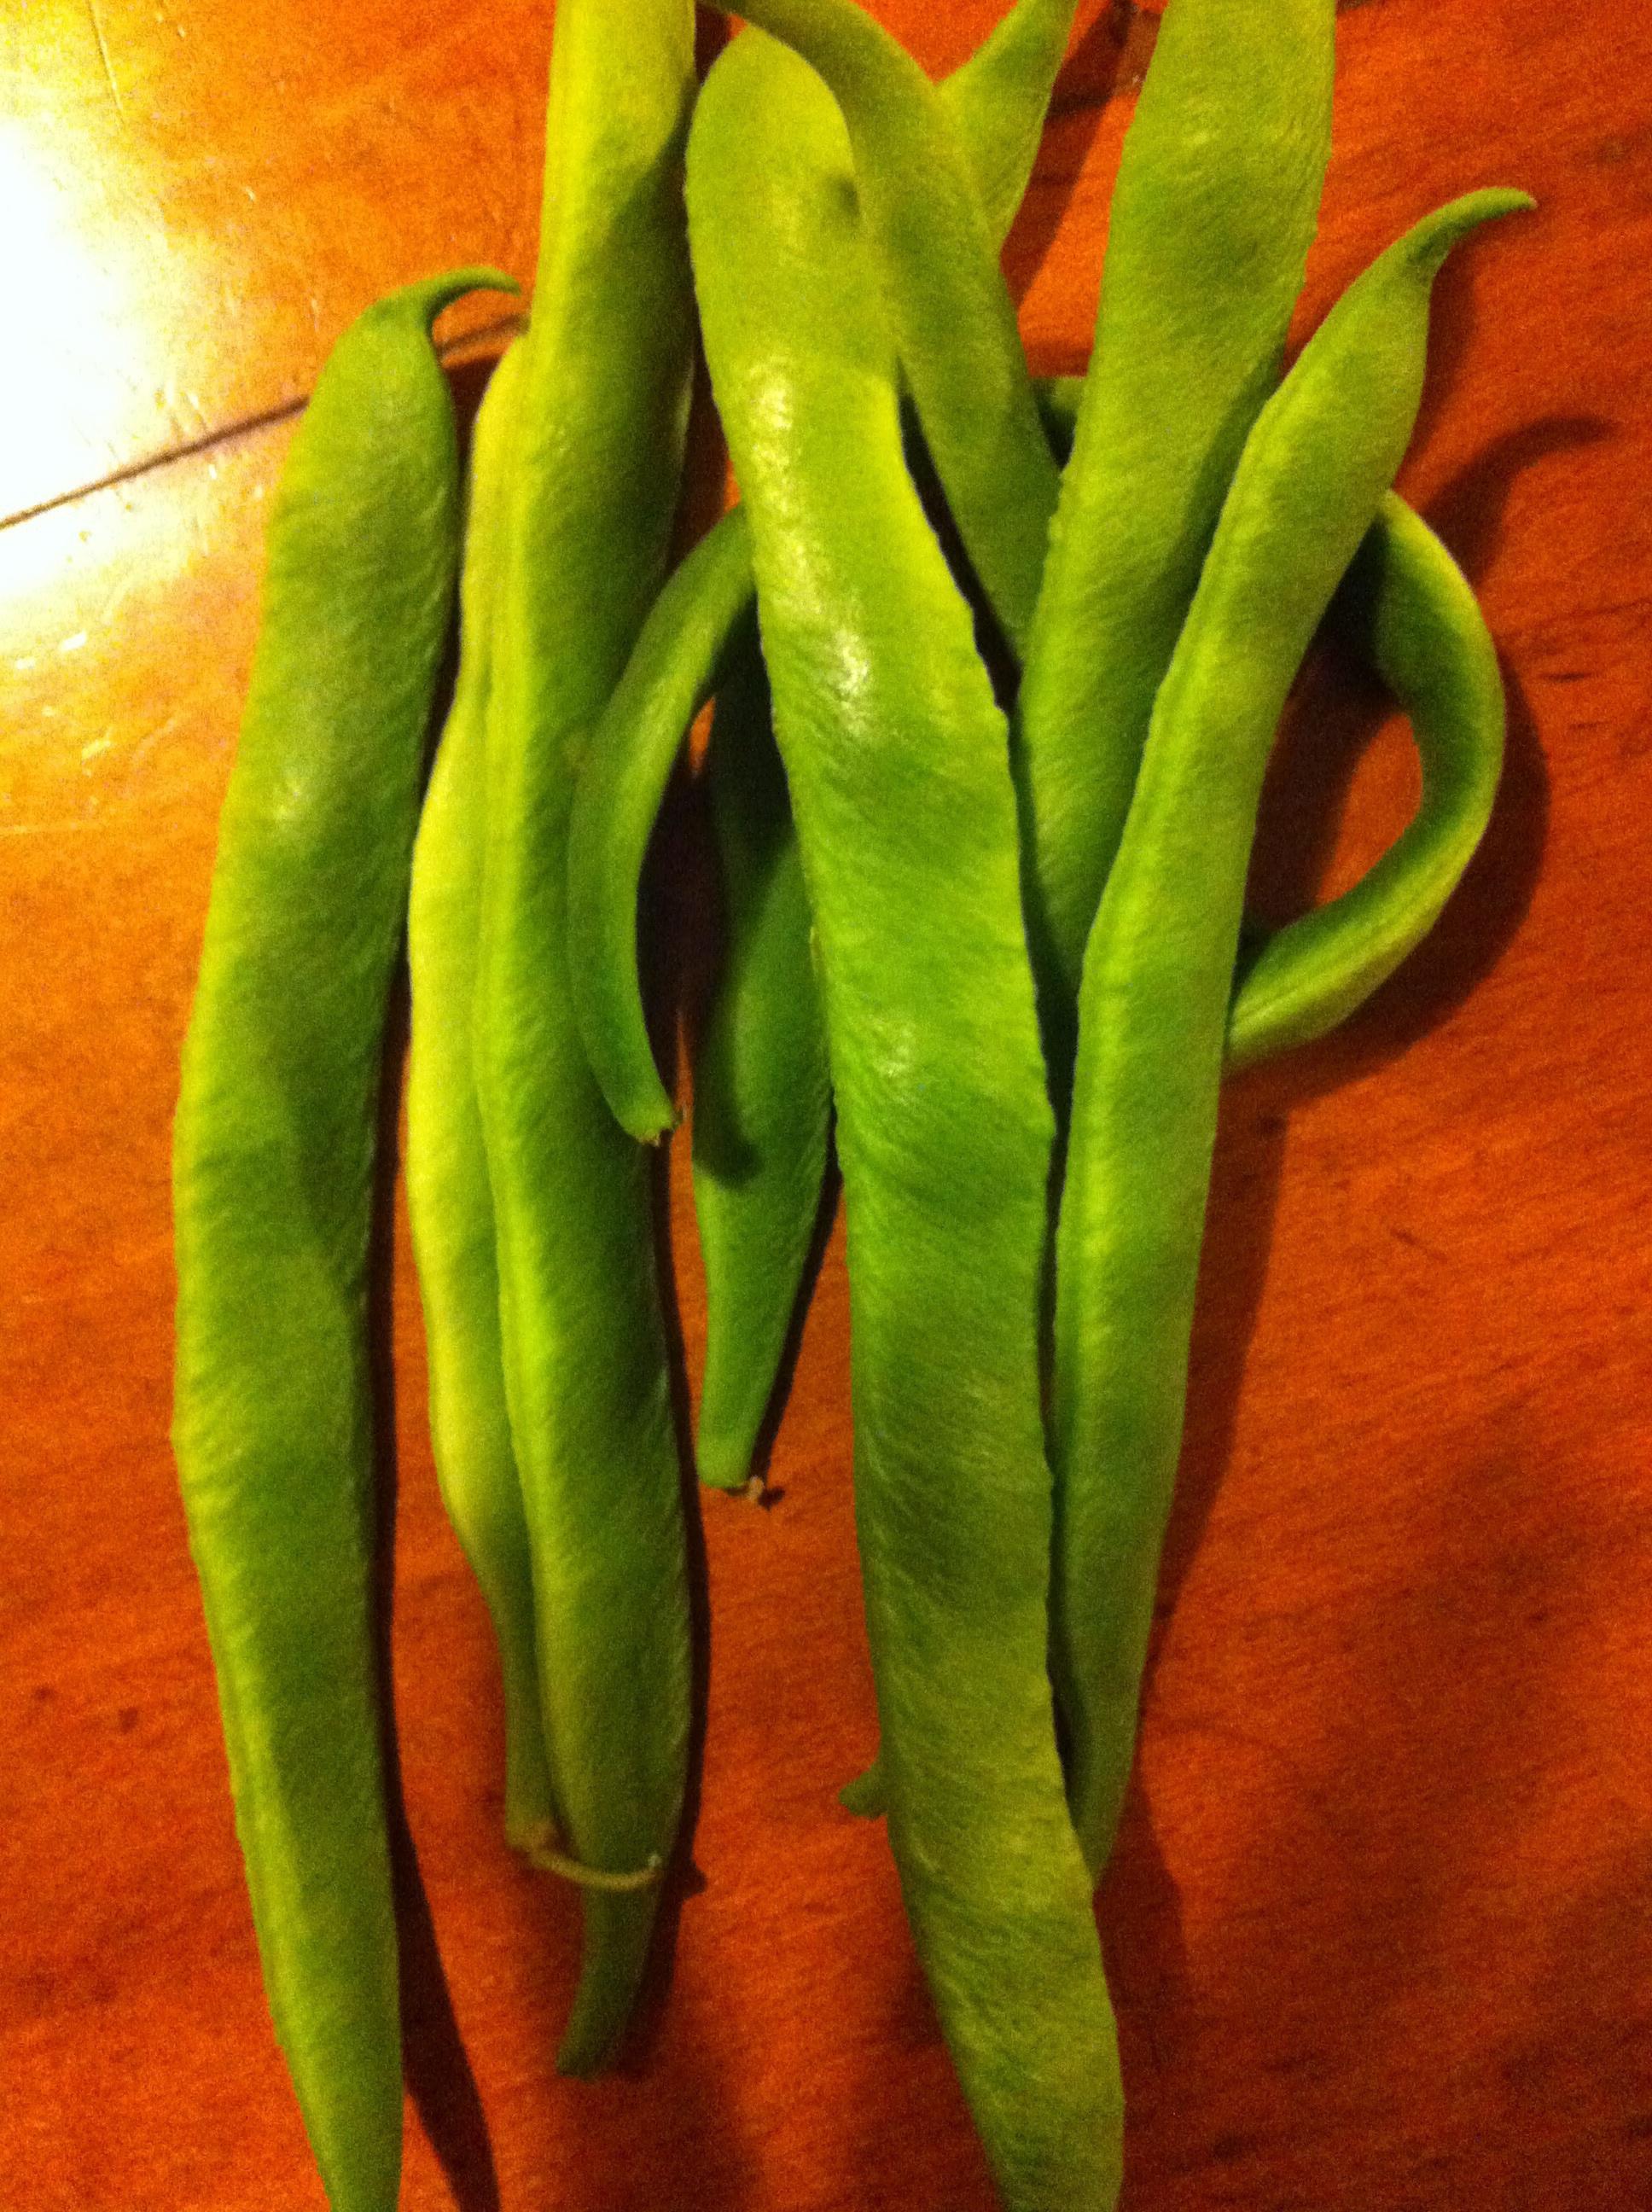 Home-grown runner beans!